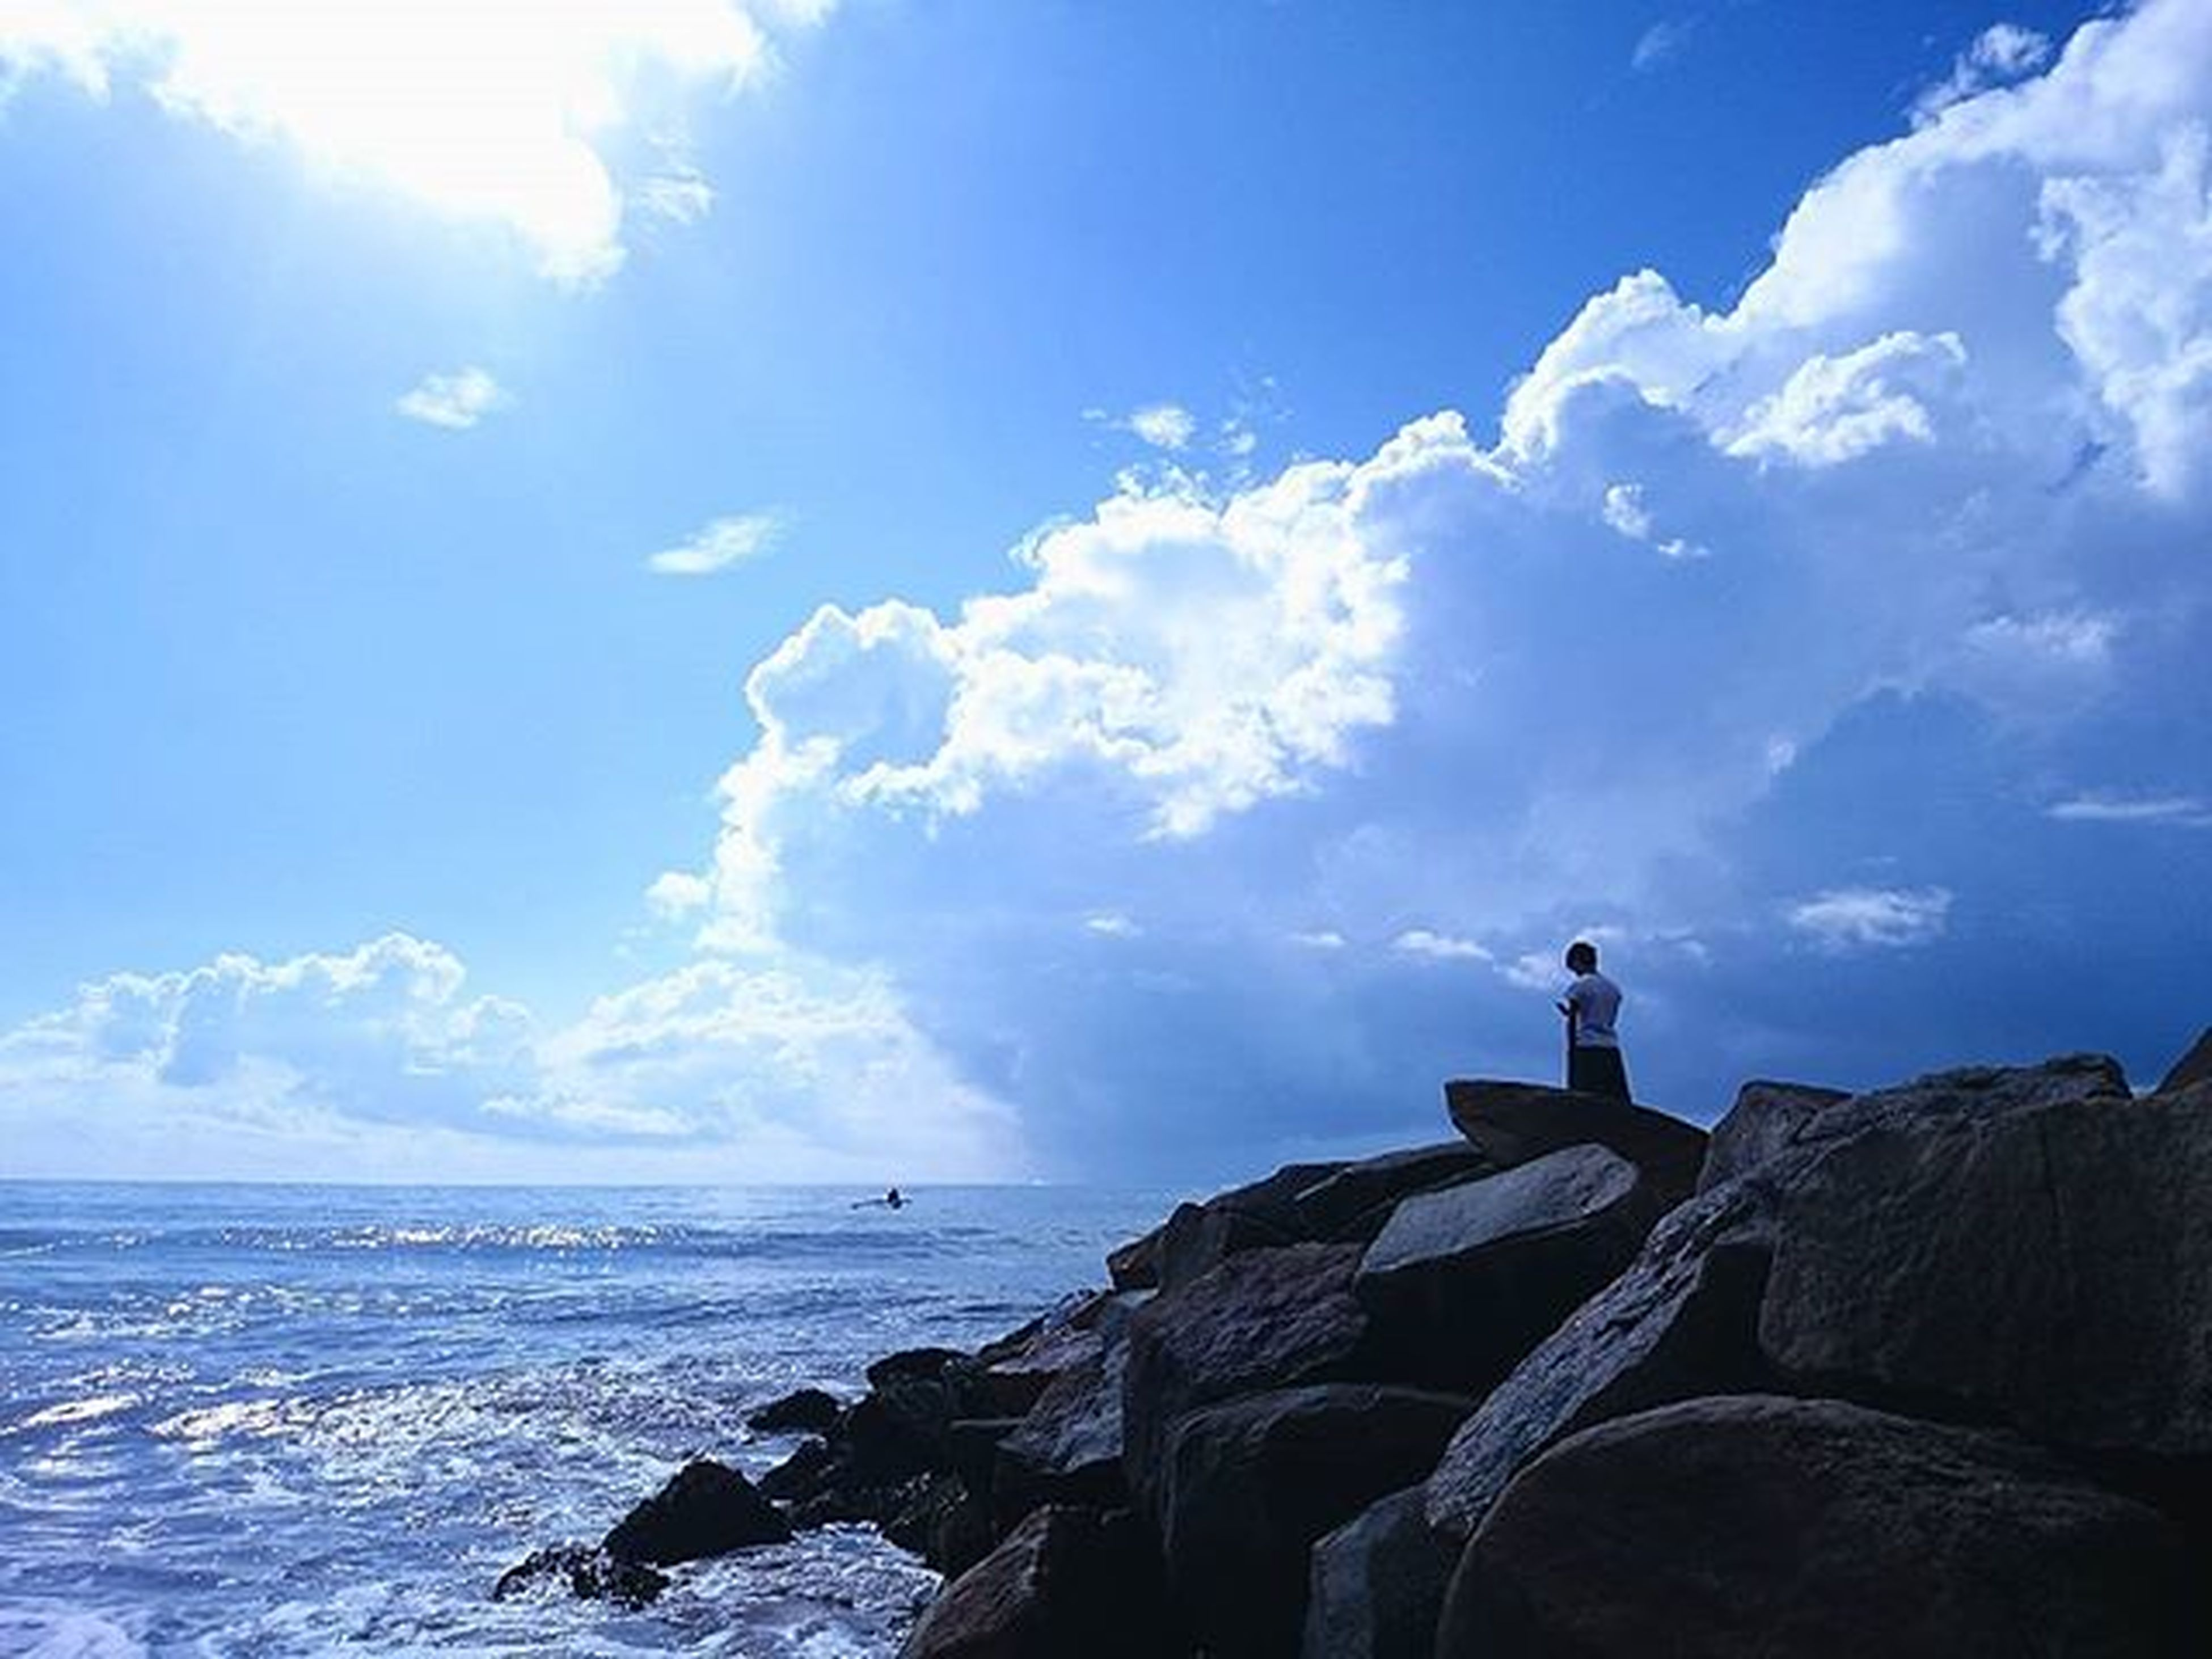 Photographer 你好攝影師 Tangele Stone Beach Blue Shine Sea Ocean Indianocean Sky Blue Cloud Trip Journey Wave